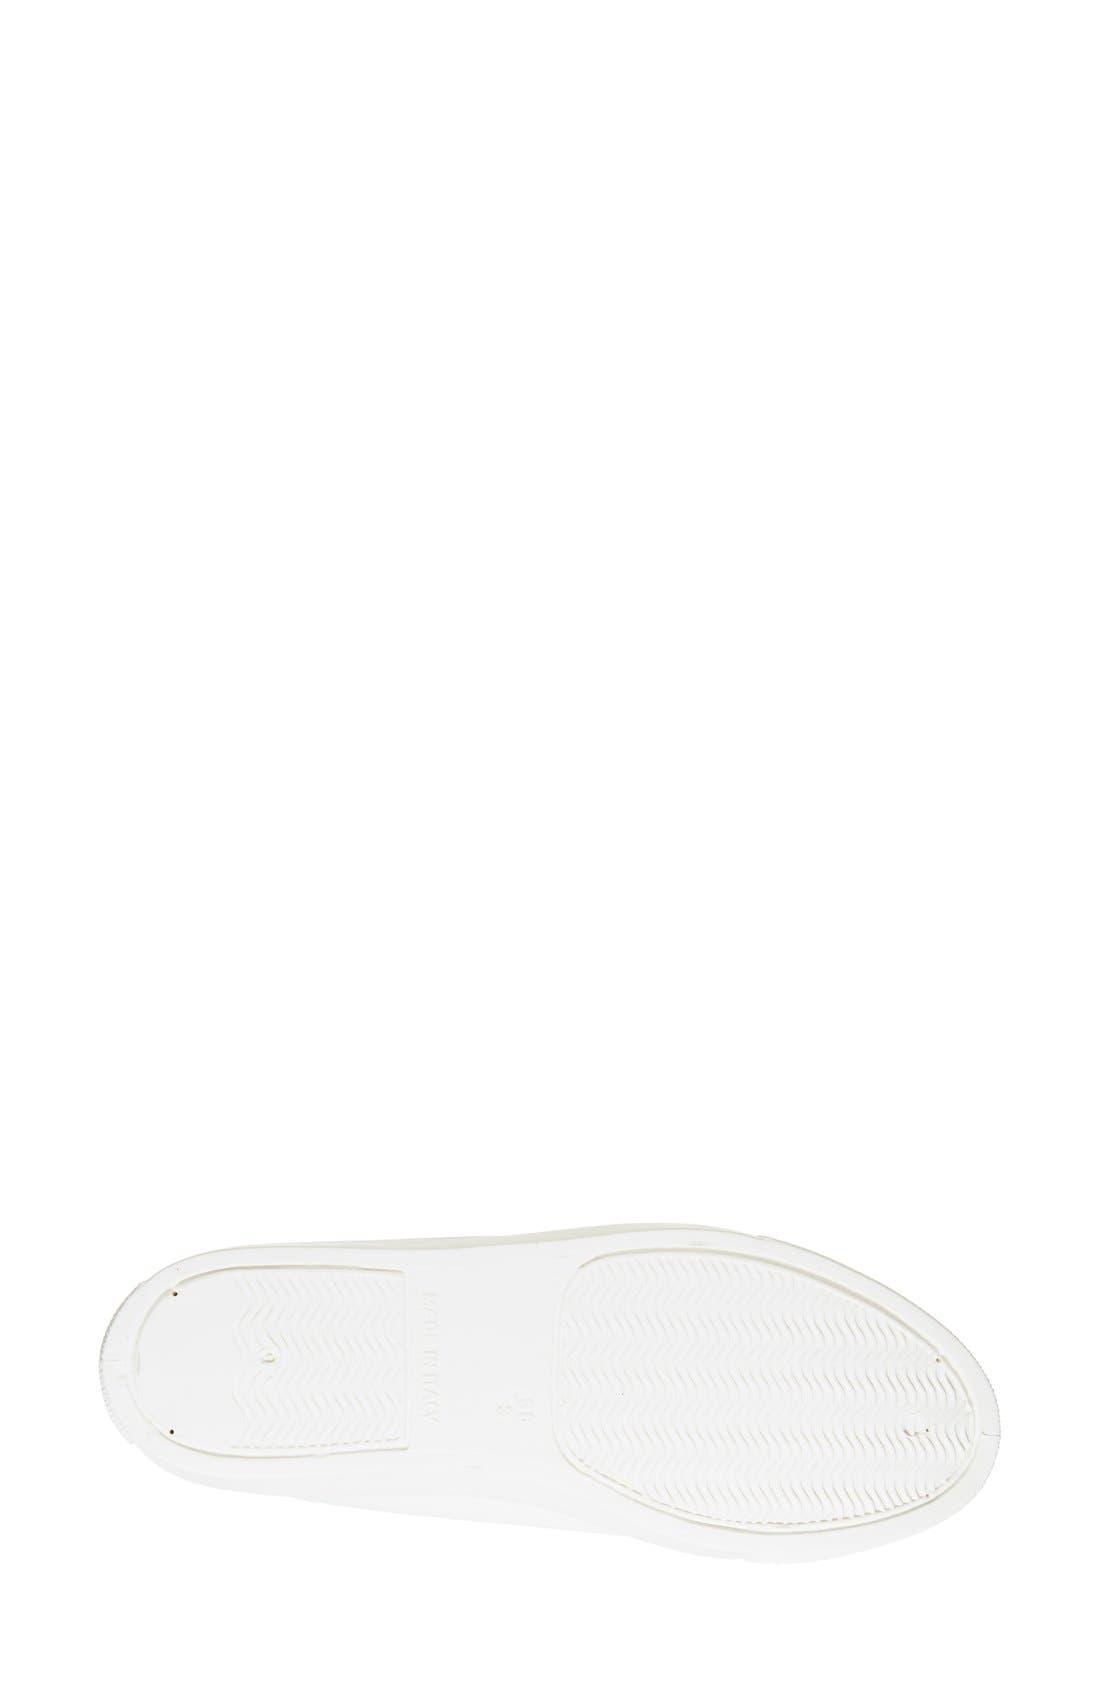 'Copenhagen' Lizard Embossed Faux Leather Sneaker,                             Alternate thumbnail 5, color,                             White